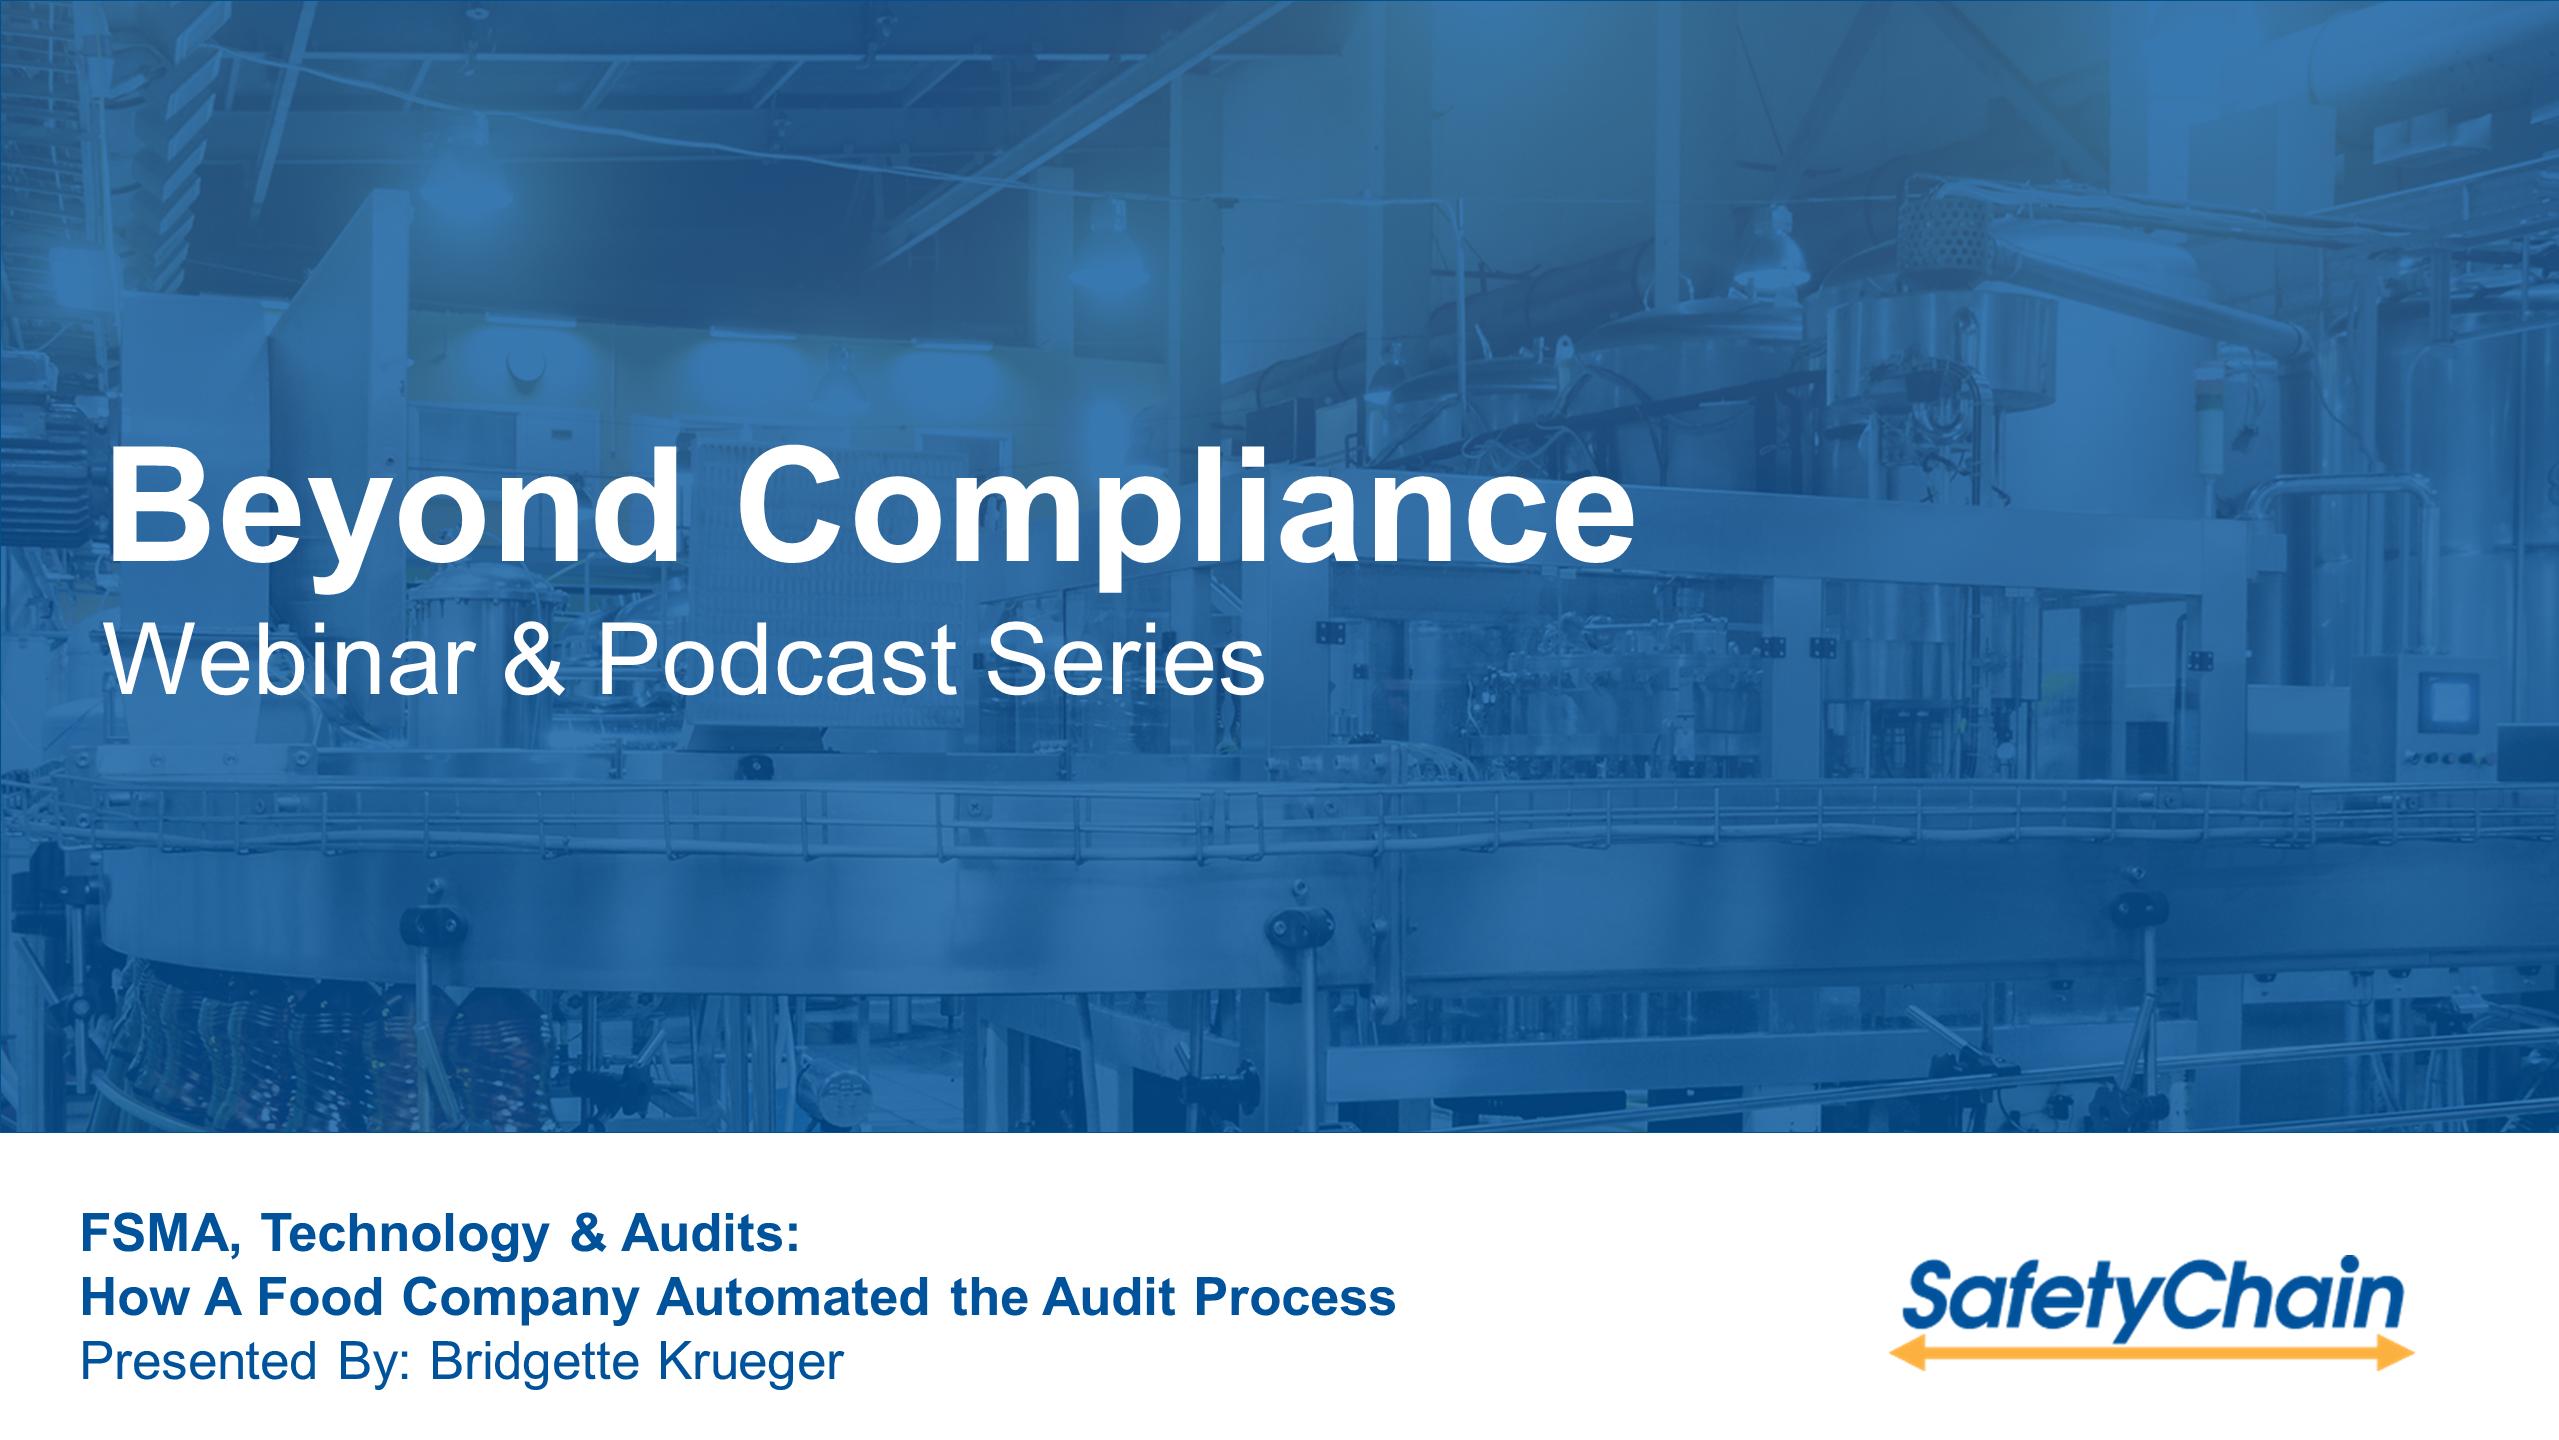 FSMA, Technology & Audits Title